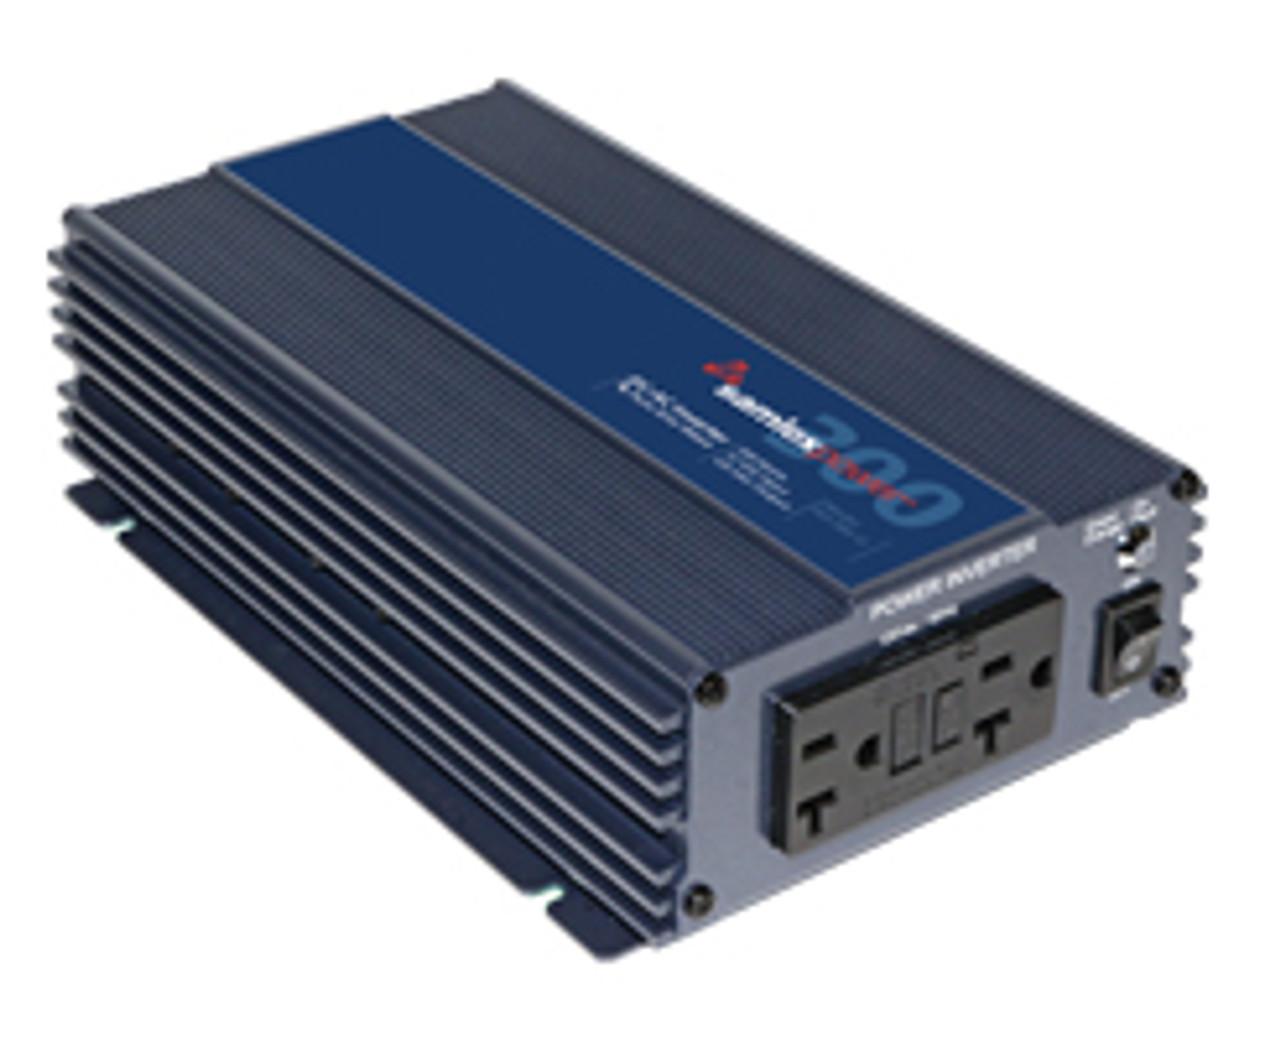 SamlexAmerica® PST-300-12 PST Series 300 Watt, 12VDC DC-to-AC Pure Sine  Wave Inverter w/ Detachable 12V Plug & Battery Clamp Cables